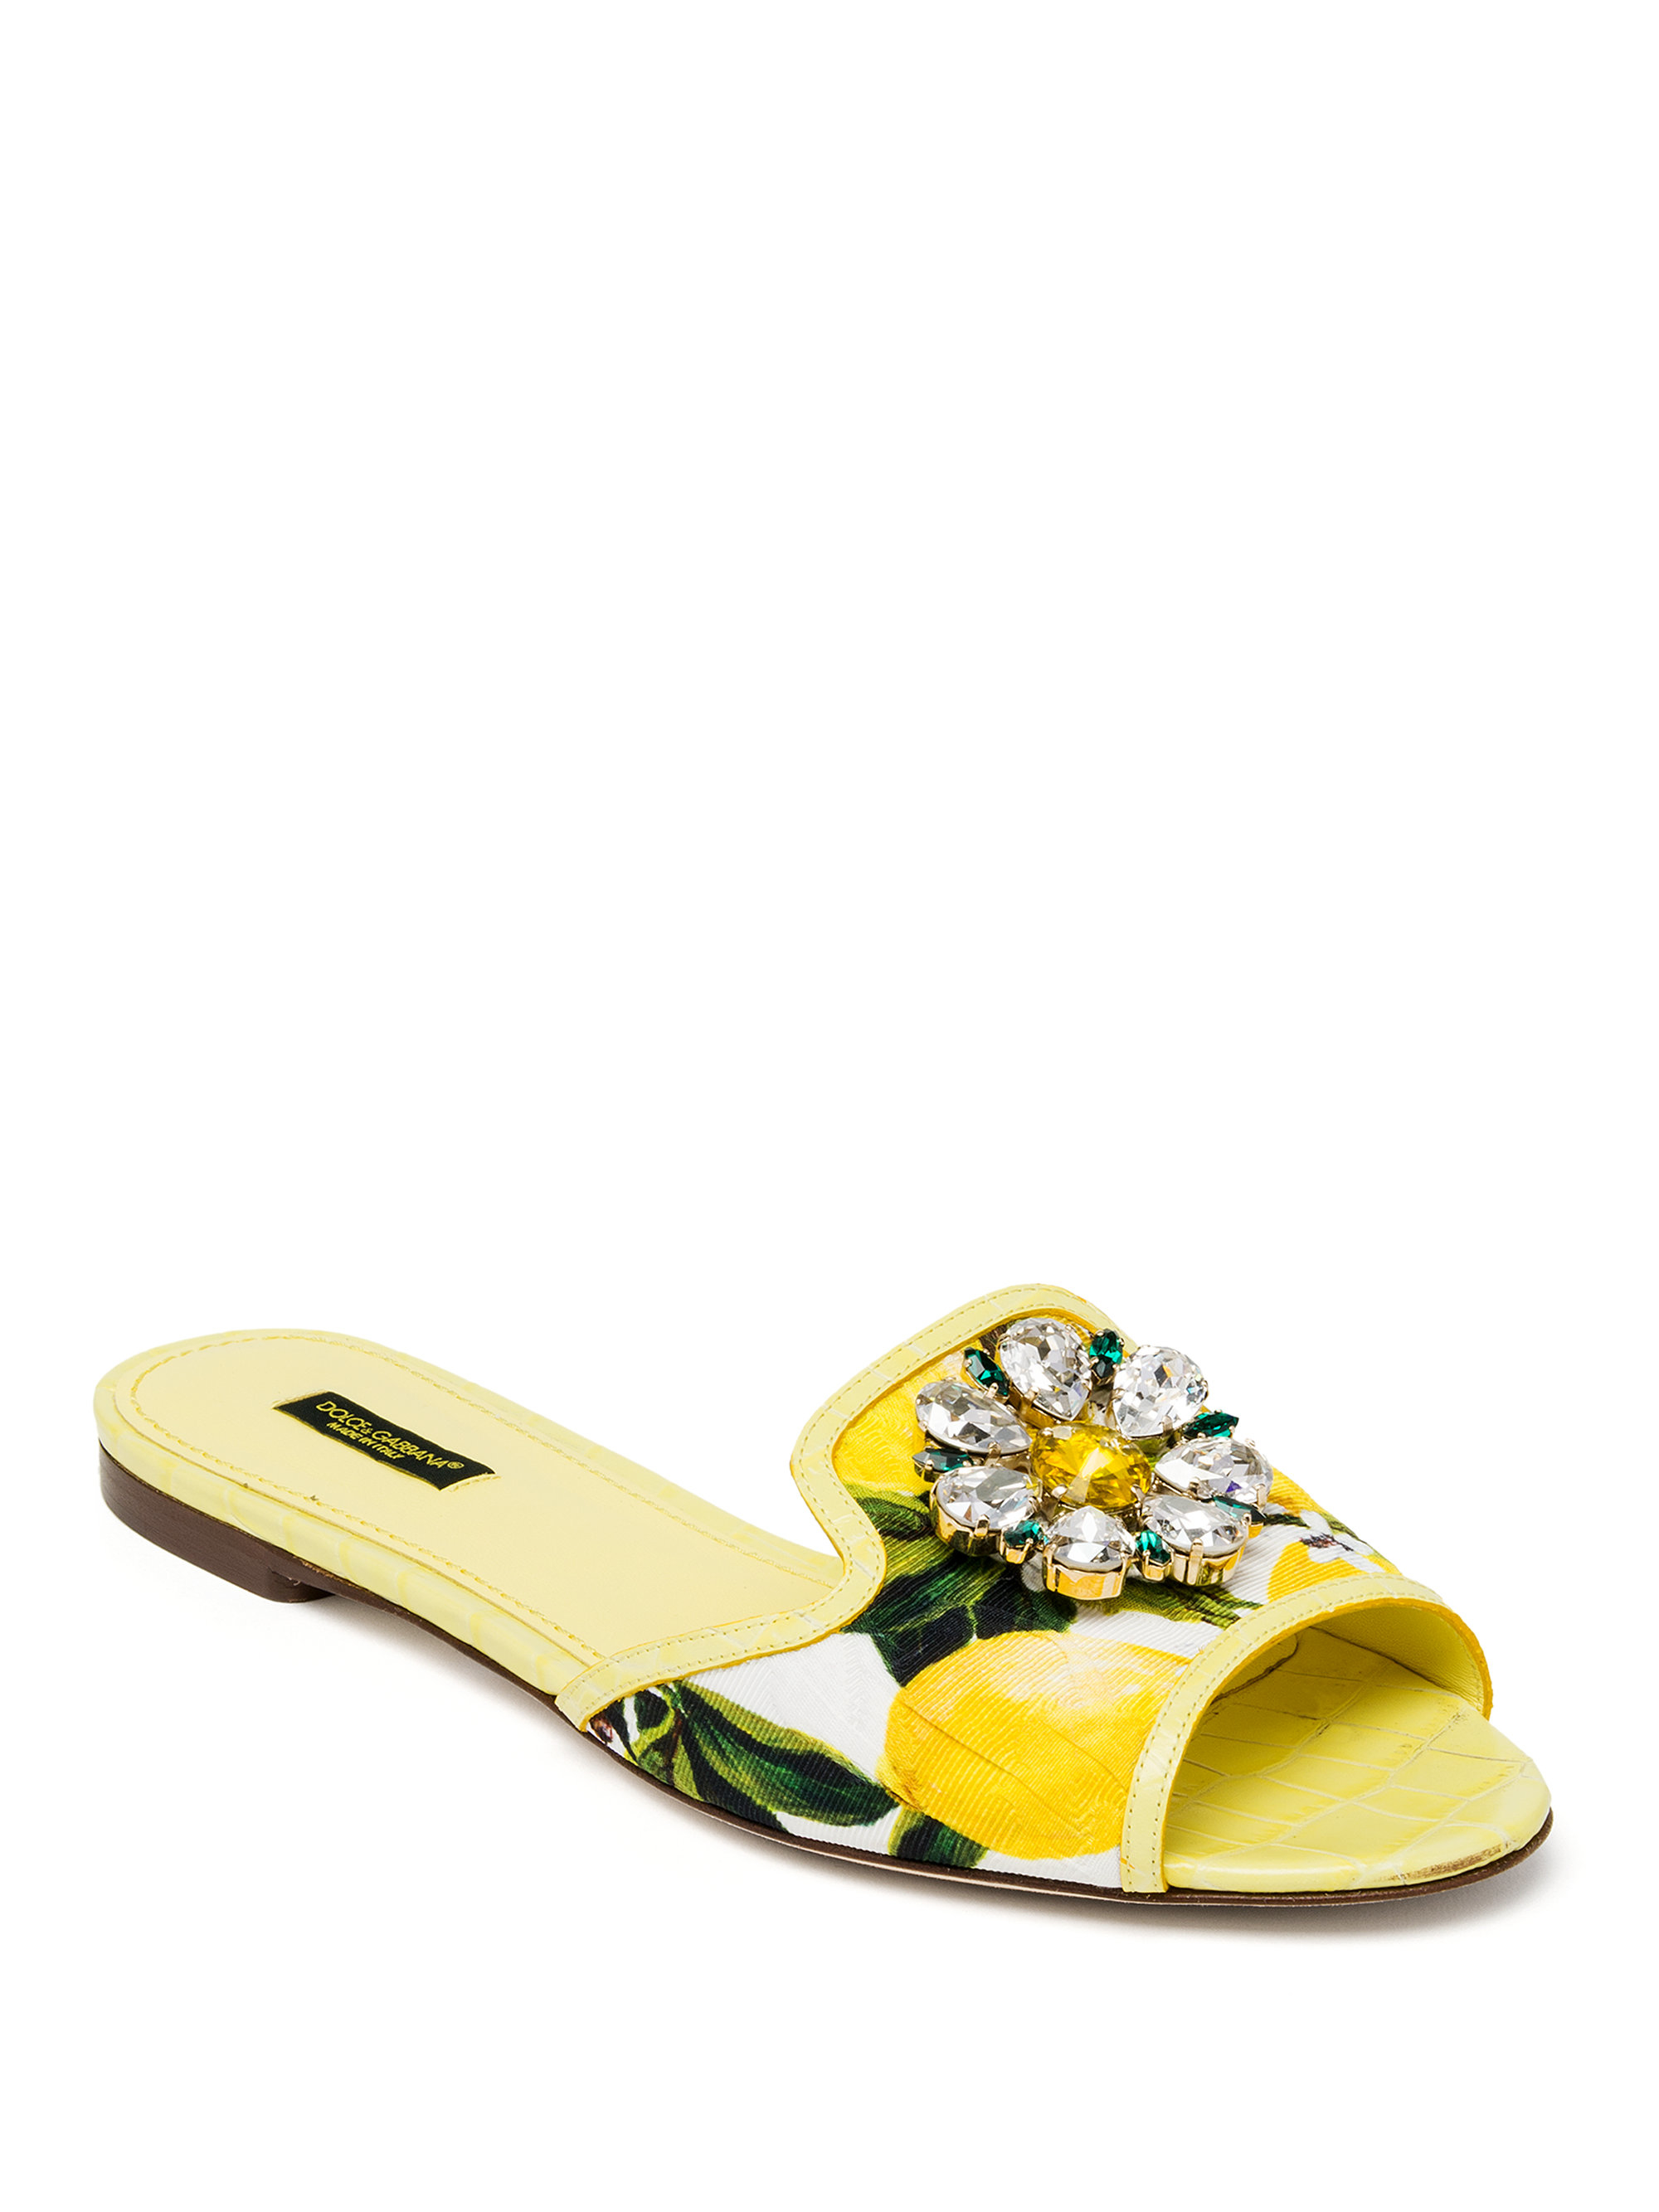 Dolce Amp Gabbana Jeweled Lemon Slide Sandals In Yellow Lyst